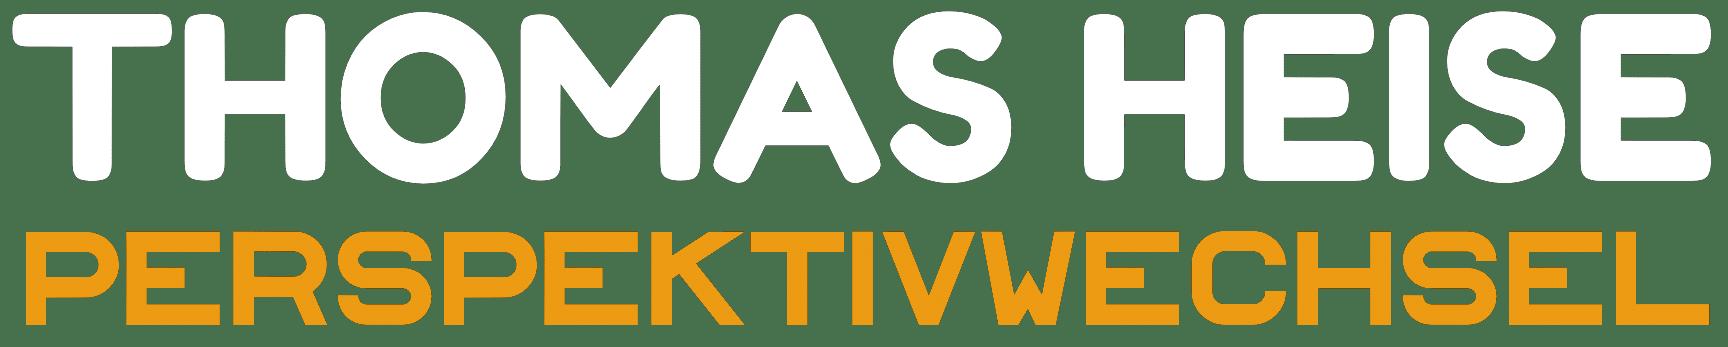 Thomas Heise Perspektivwechsel